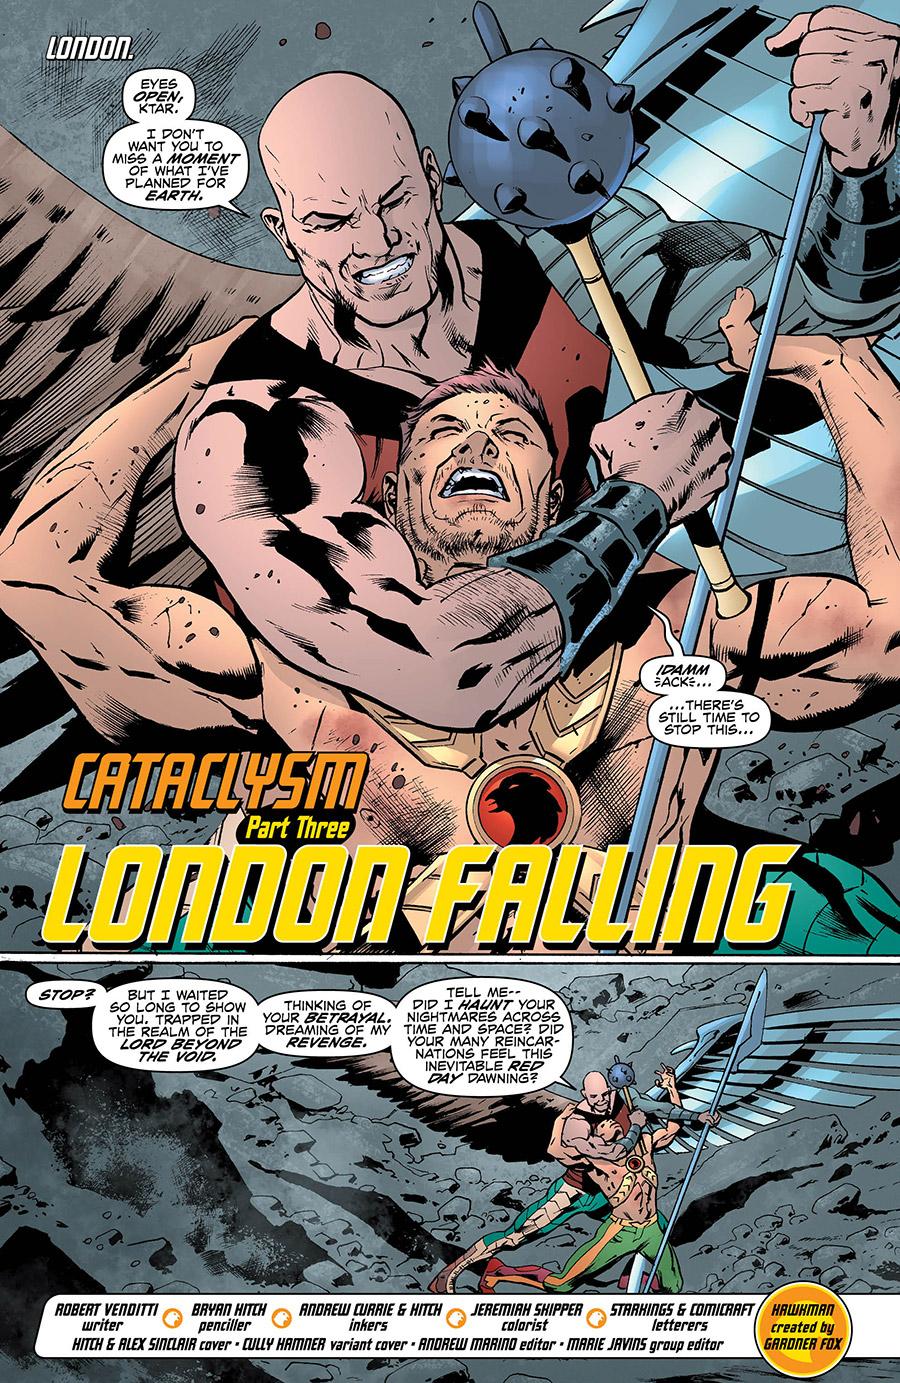 Hawkman 10_1 - DC Comics News